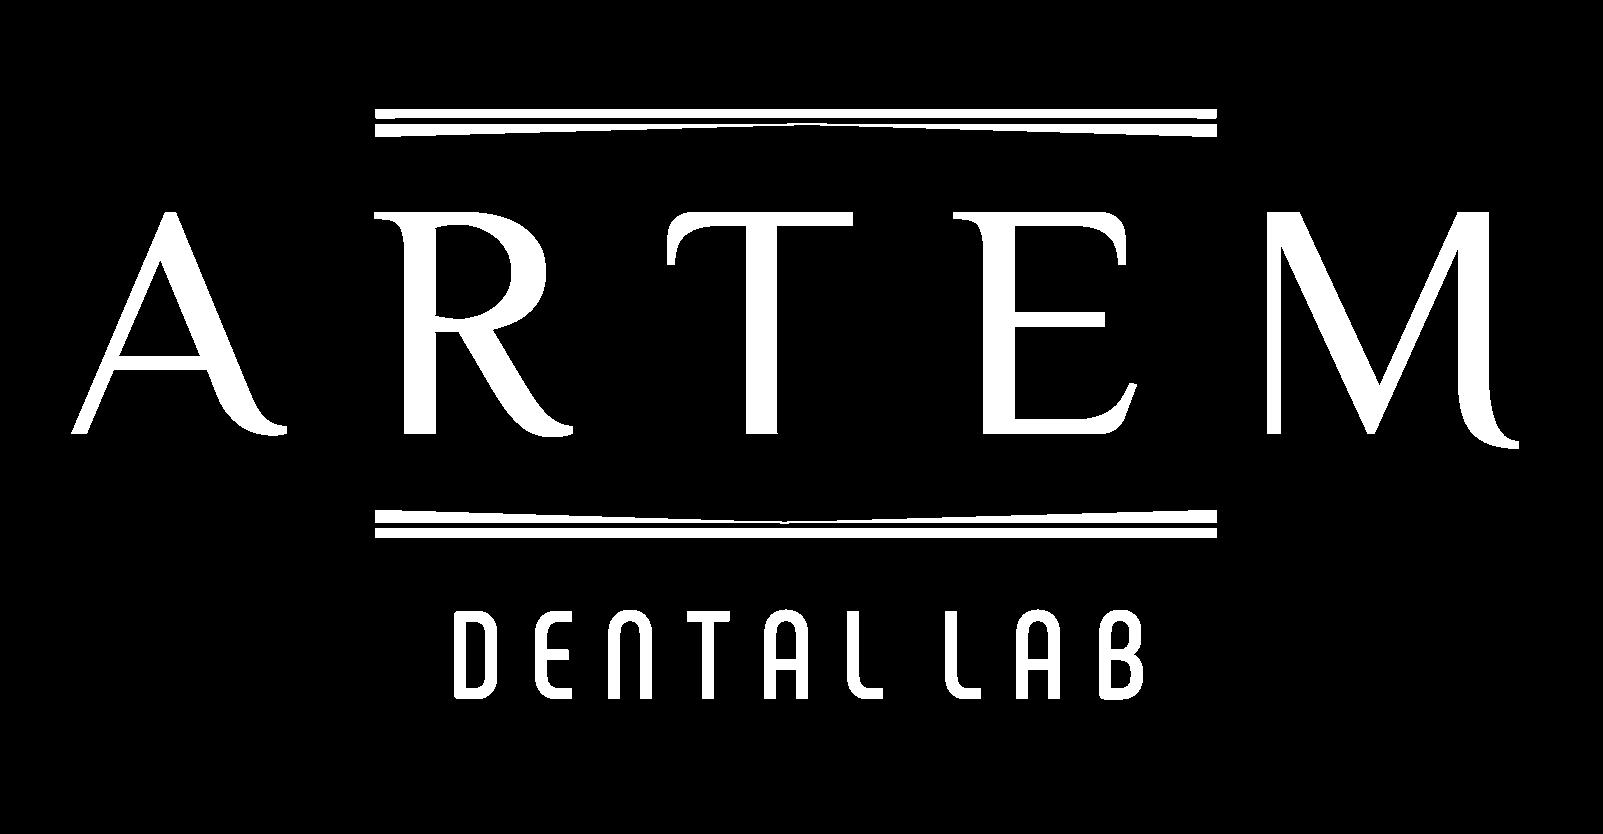 Artem dental lab